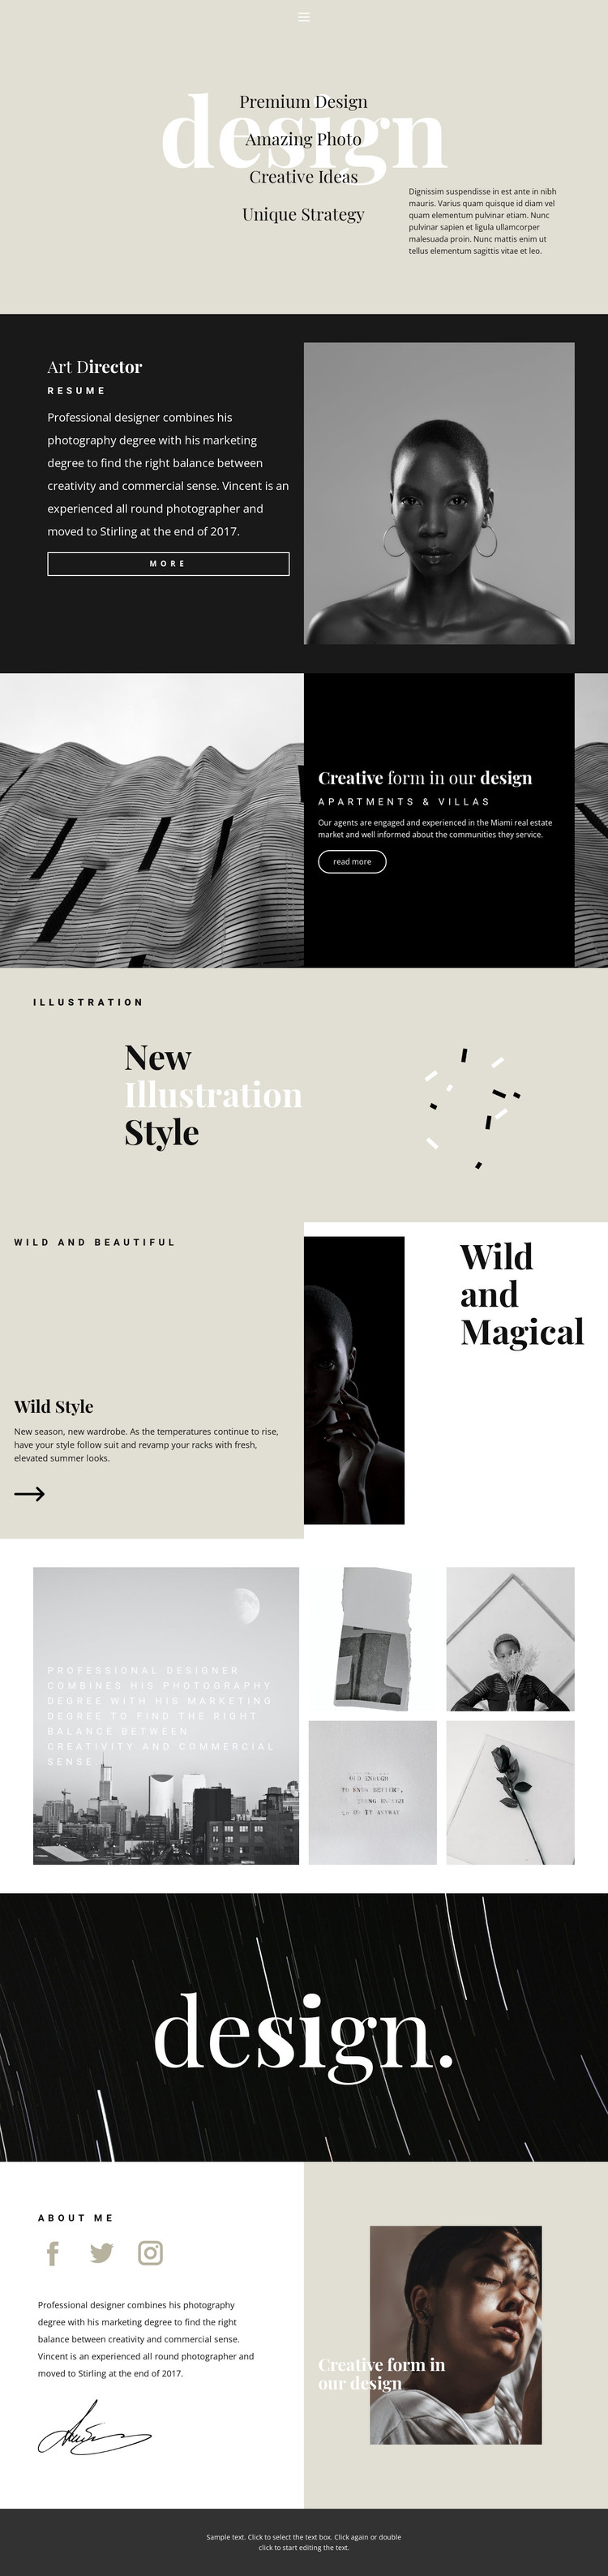 Directions of design studio WordPress Theme